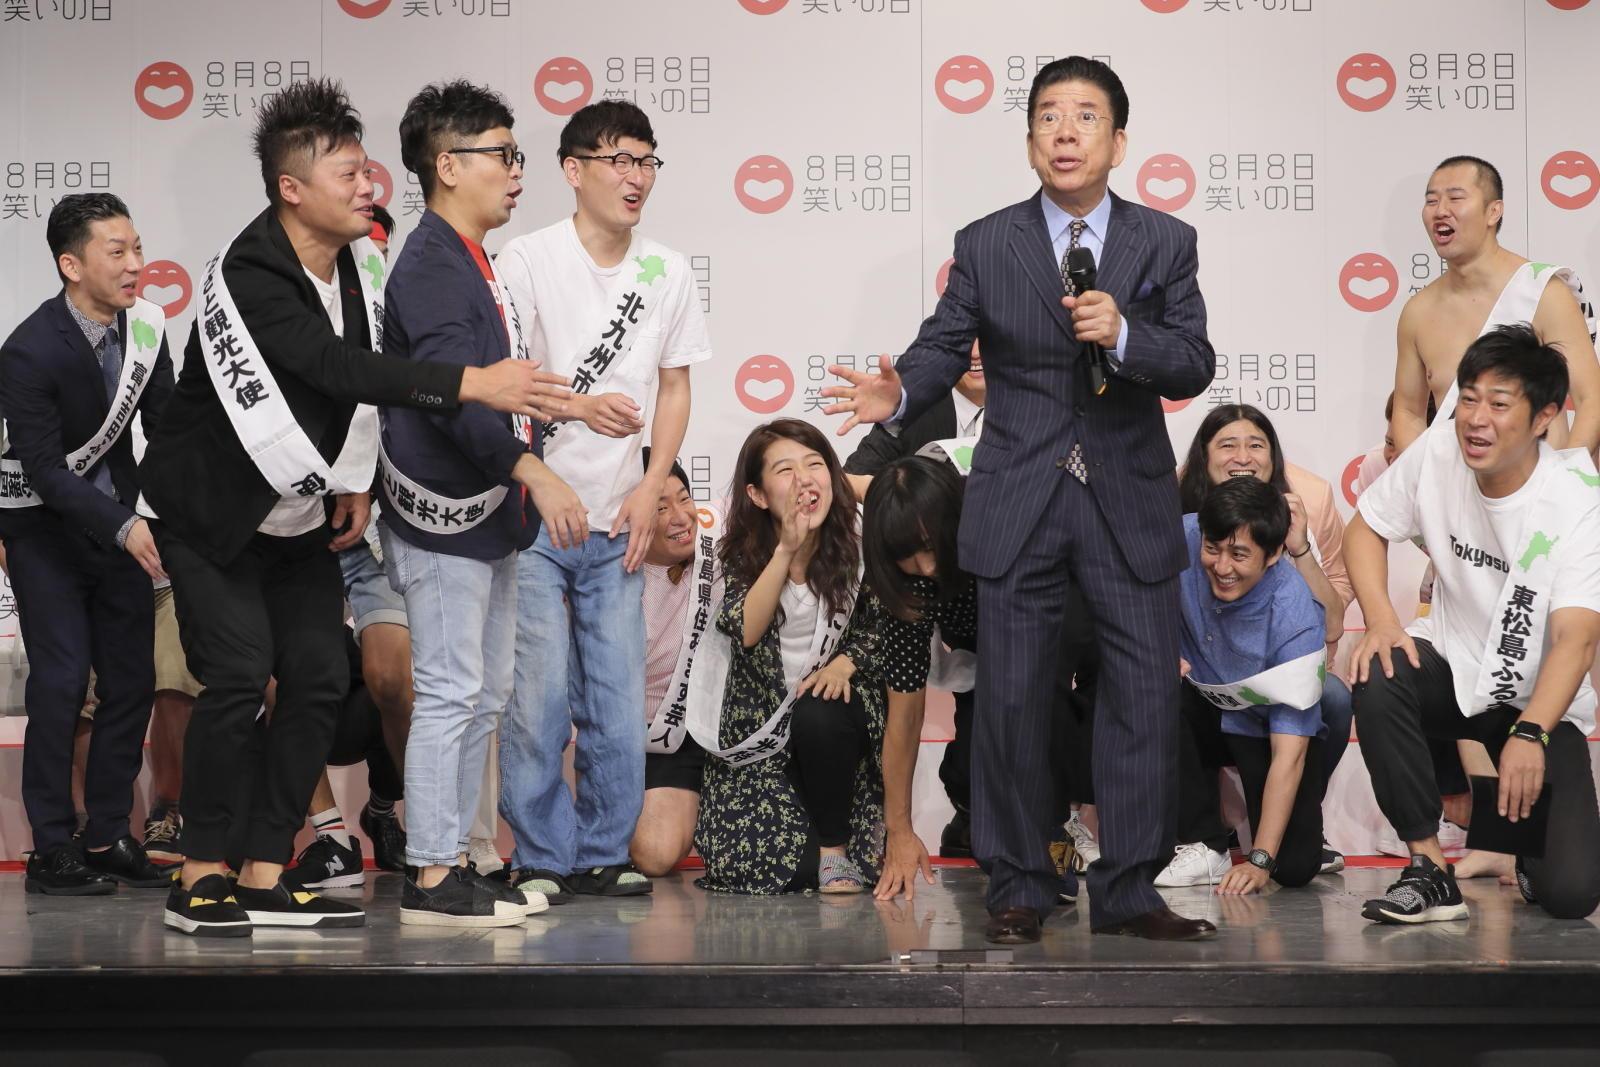 http://news.yoshimoto.co.jp/20170704220911-22f76e509863003a7a8147aaed26f50141d63542.jpg